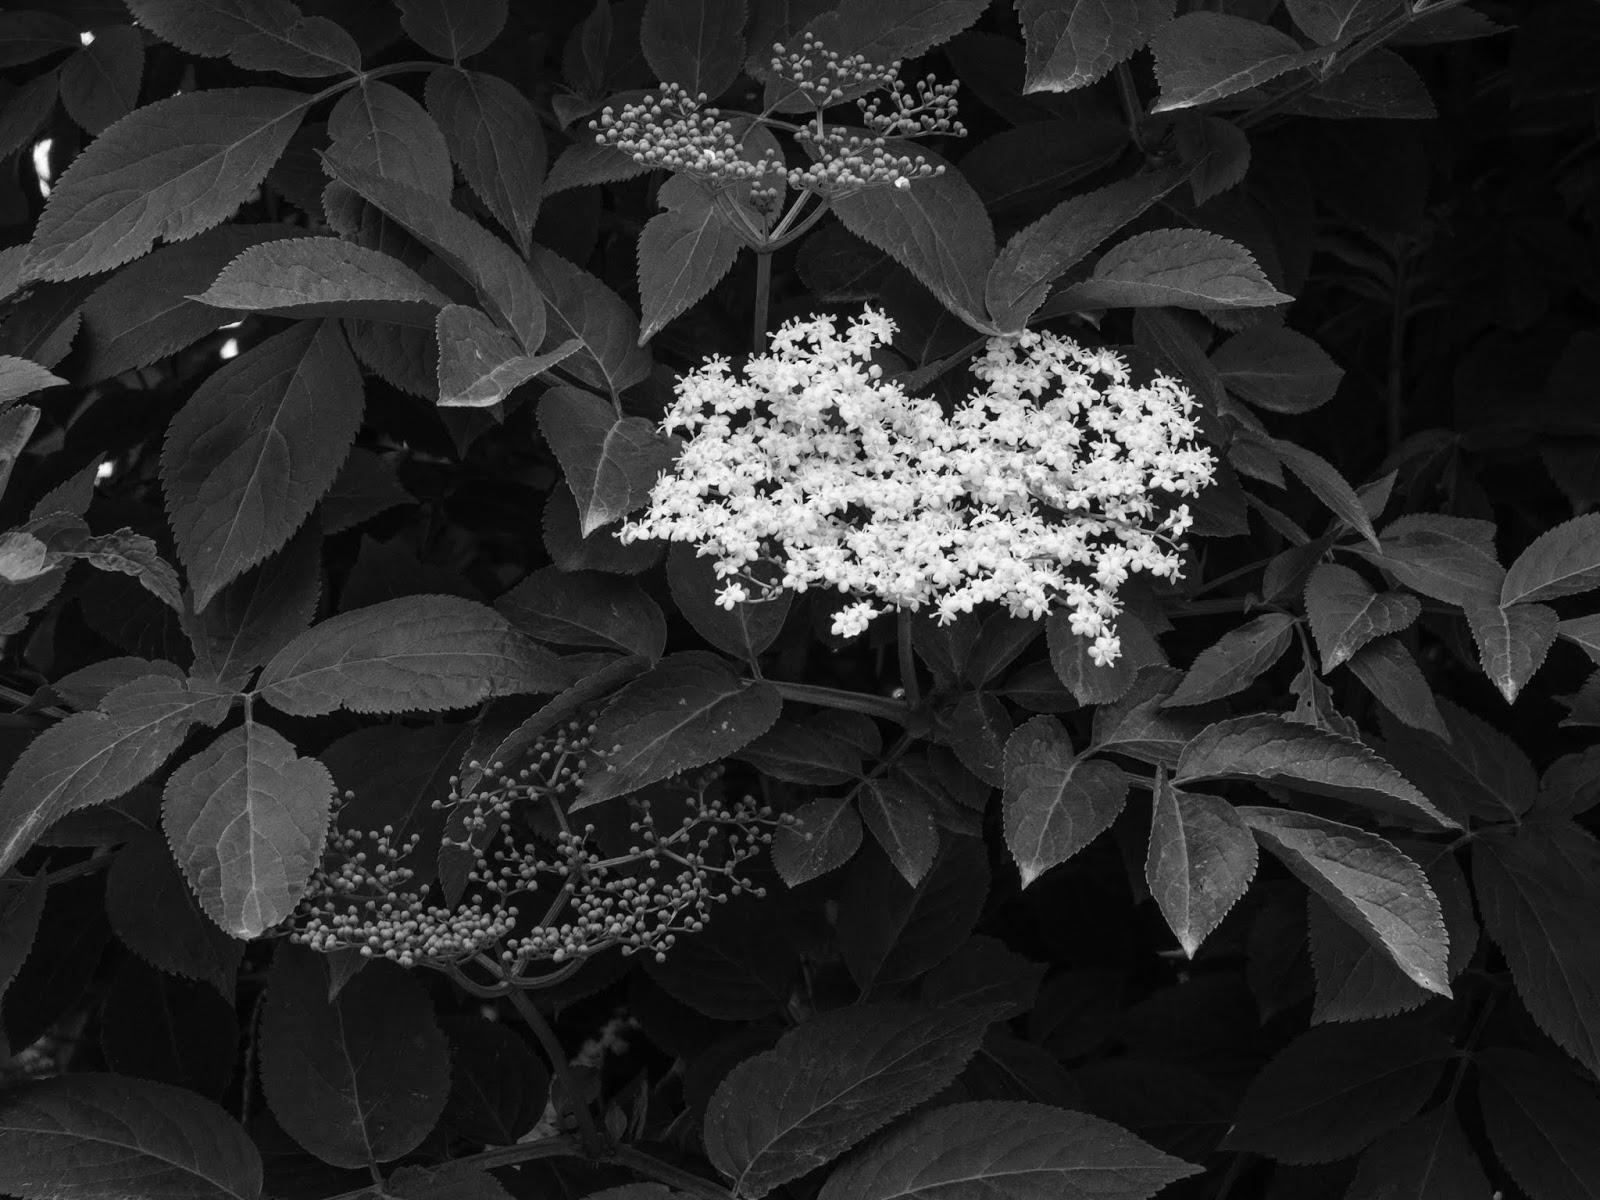 An Elderflower bush with a white flower head.